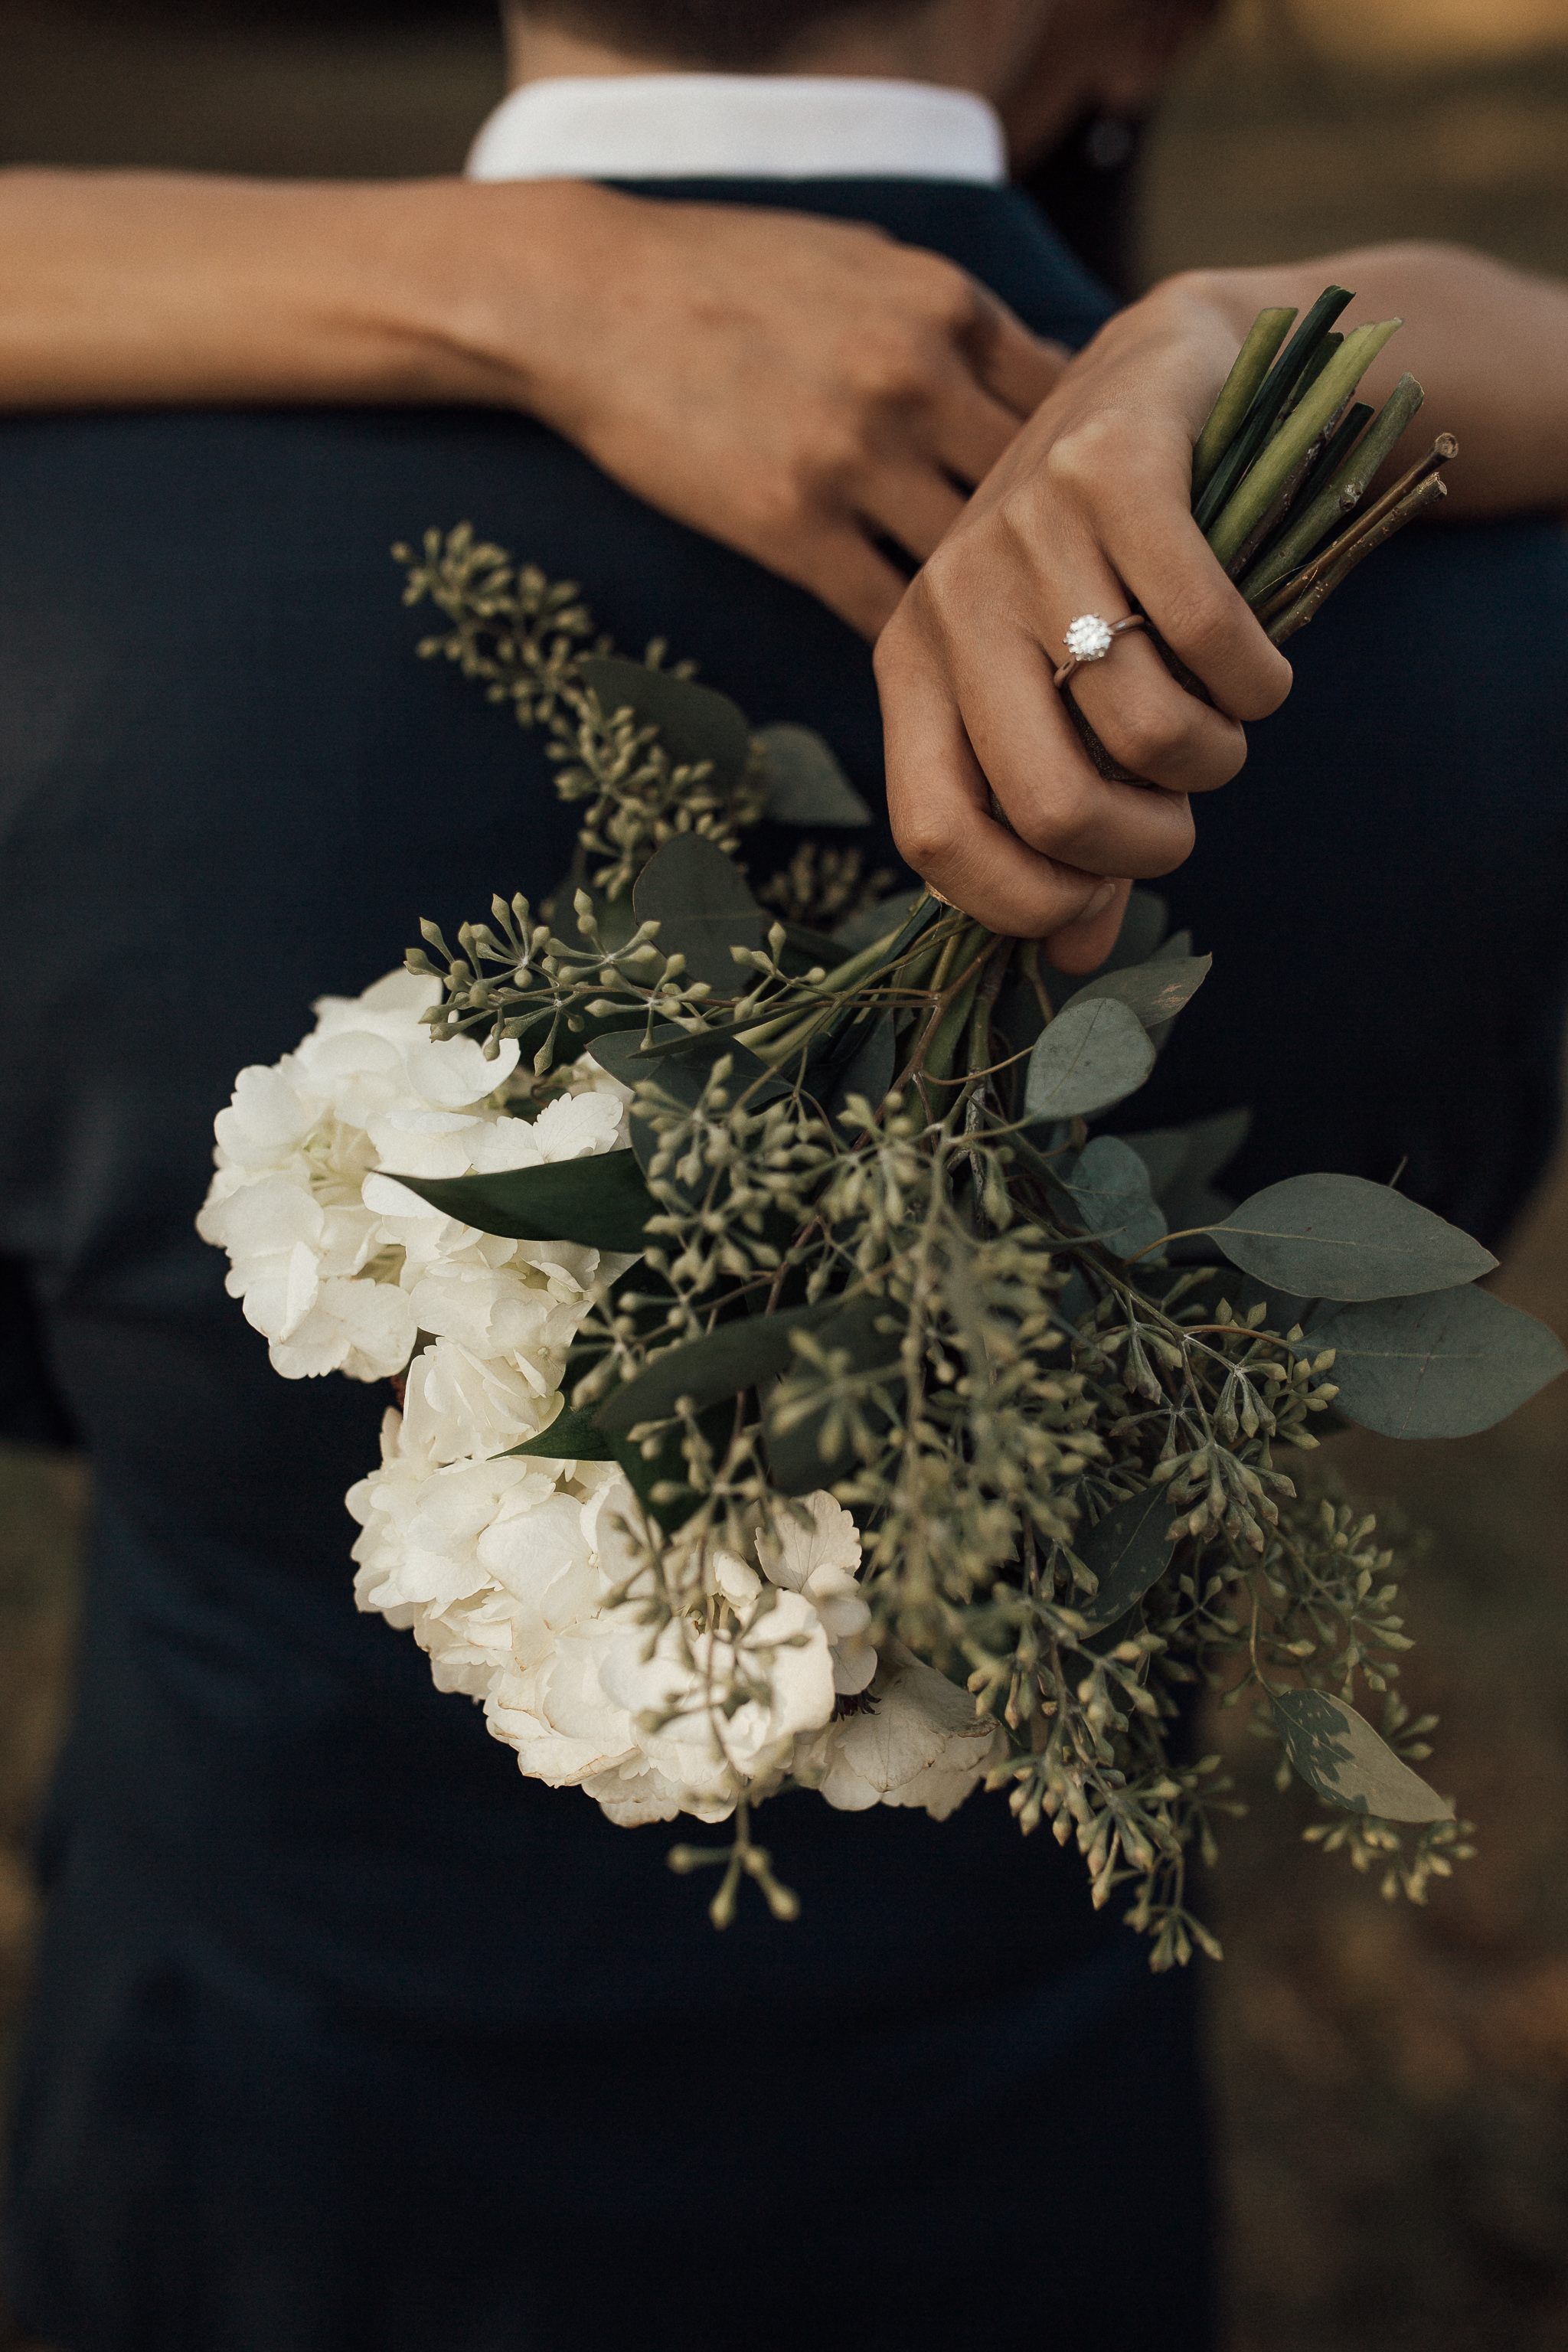 chattanooga-wedding-photographer-memphis-wedding-photographer-cassie-cook-photography